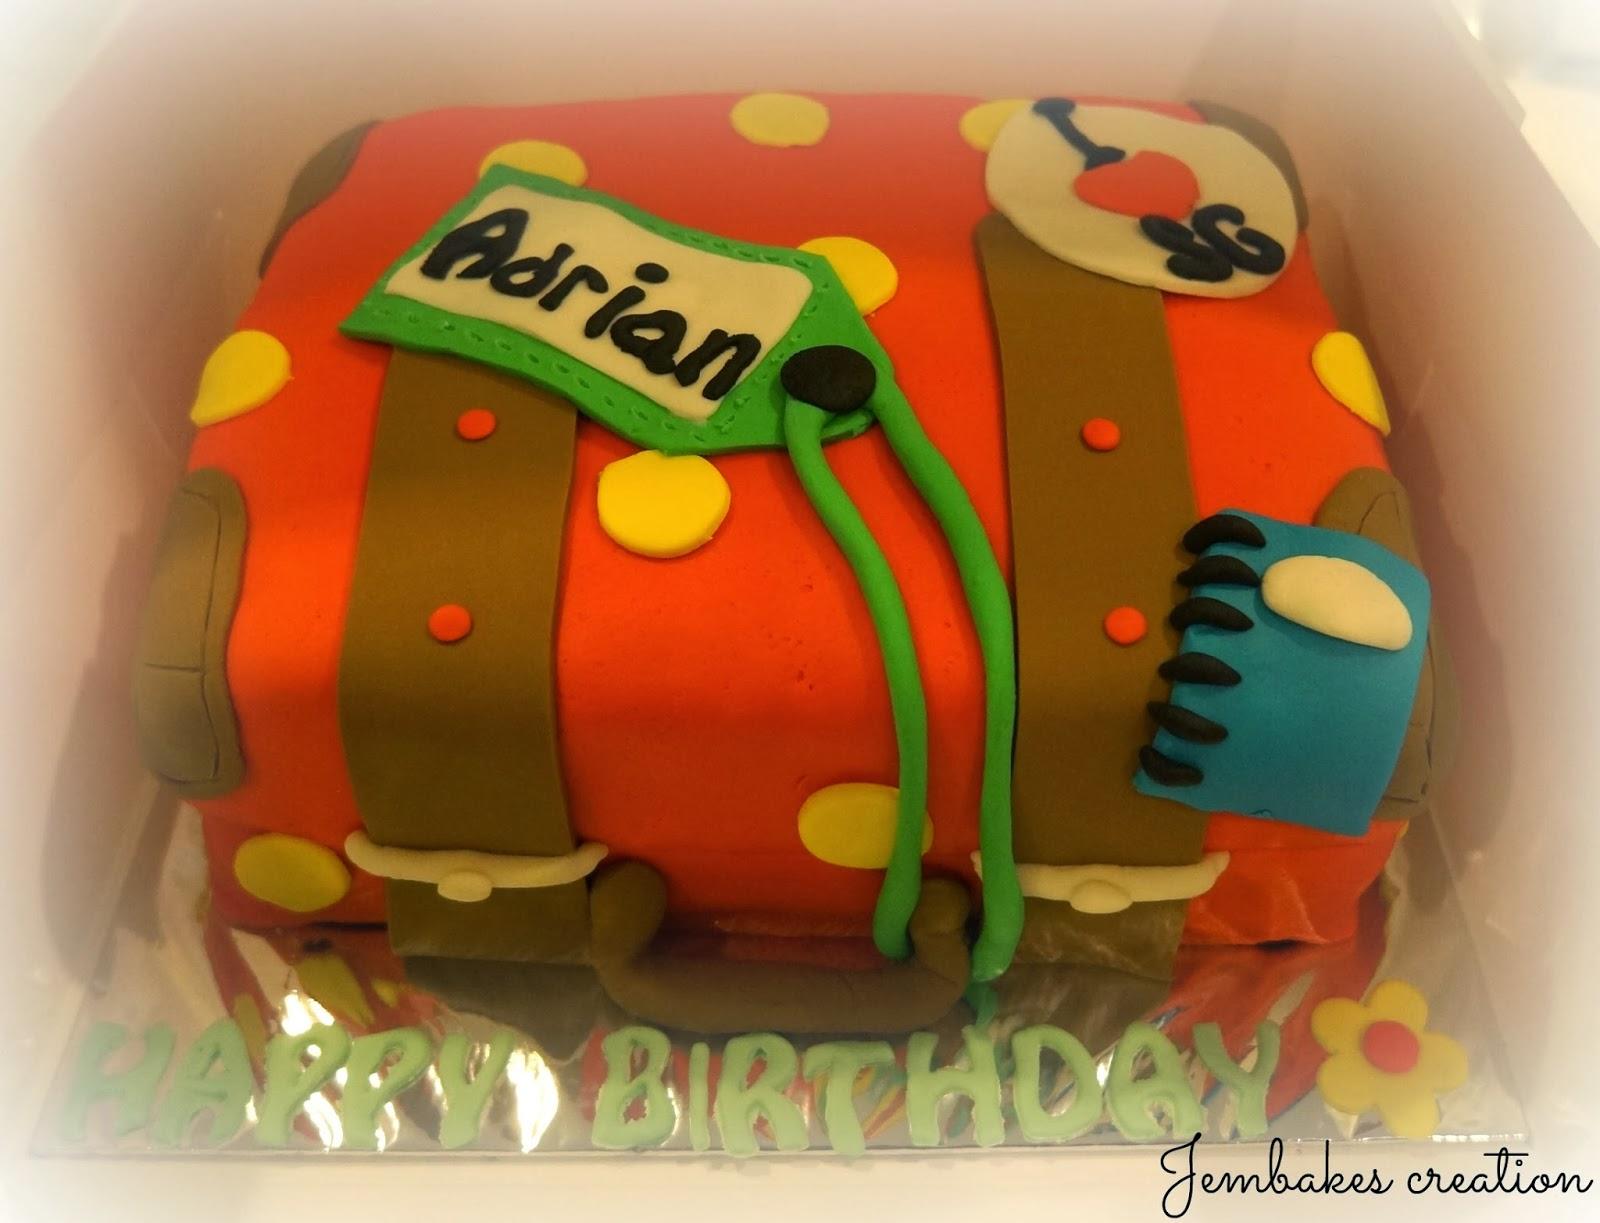 Jembakes Luggage Cake